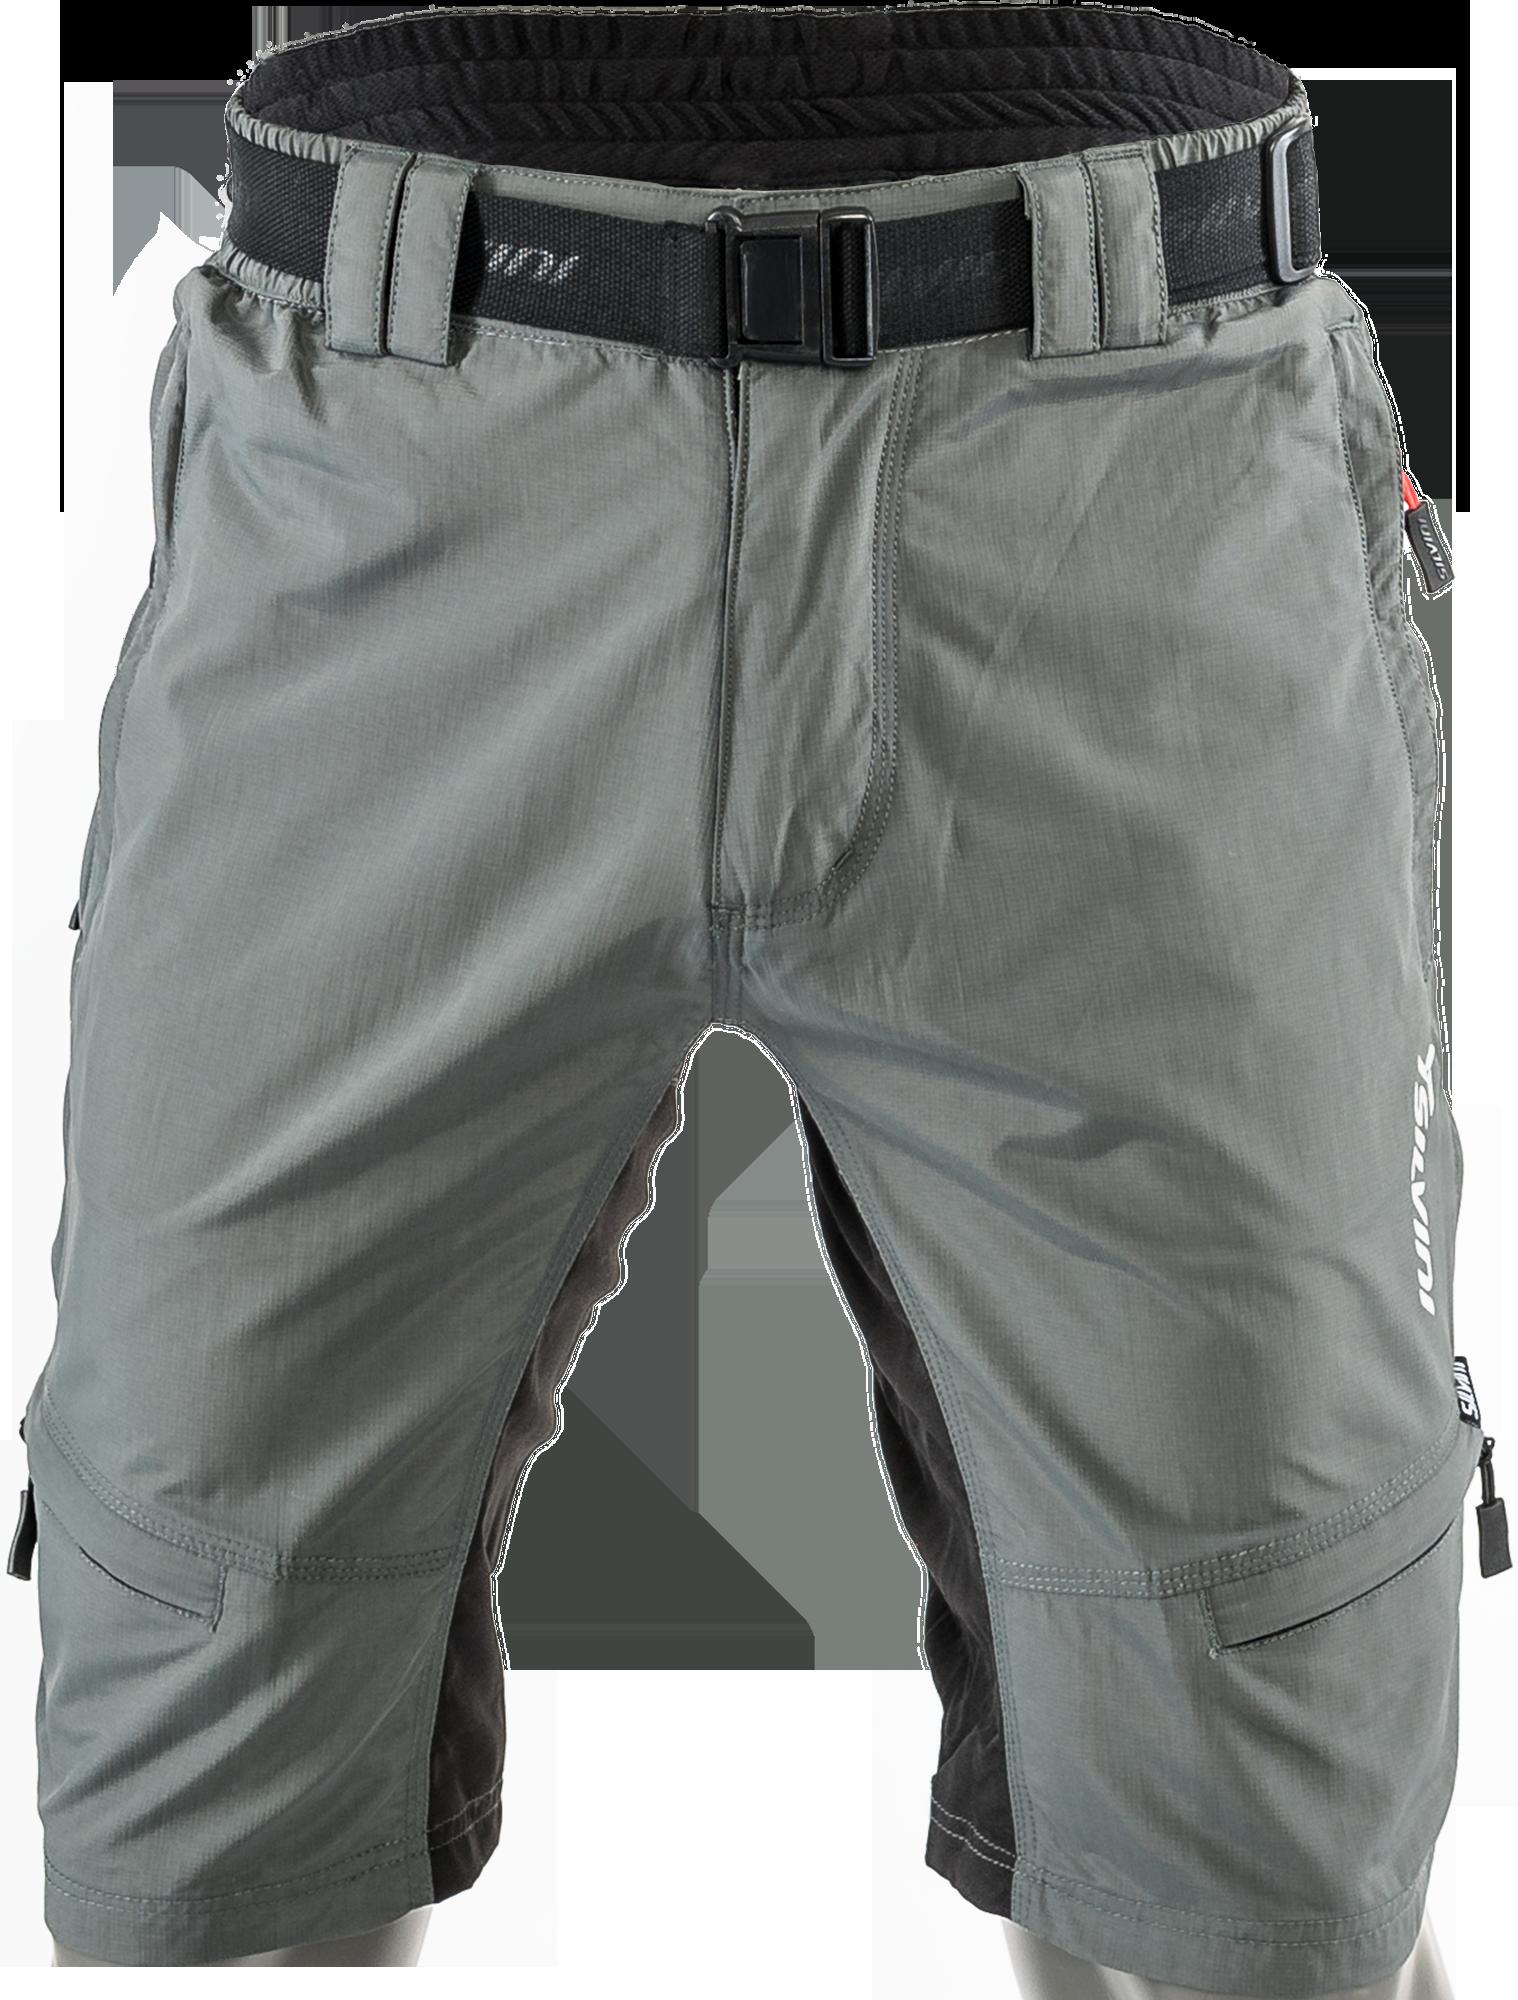 Cyklistické kalhoty MTB Silvini RANGO MP857 bez cyklovložky šedé červené  pánské dc8d6ef945